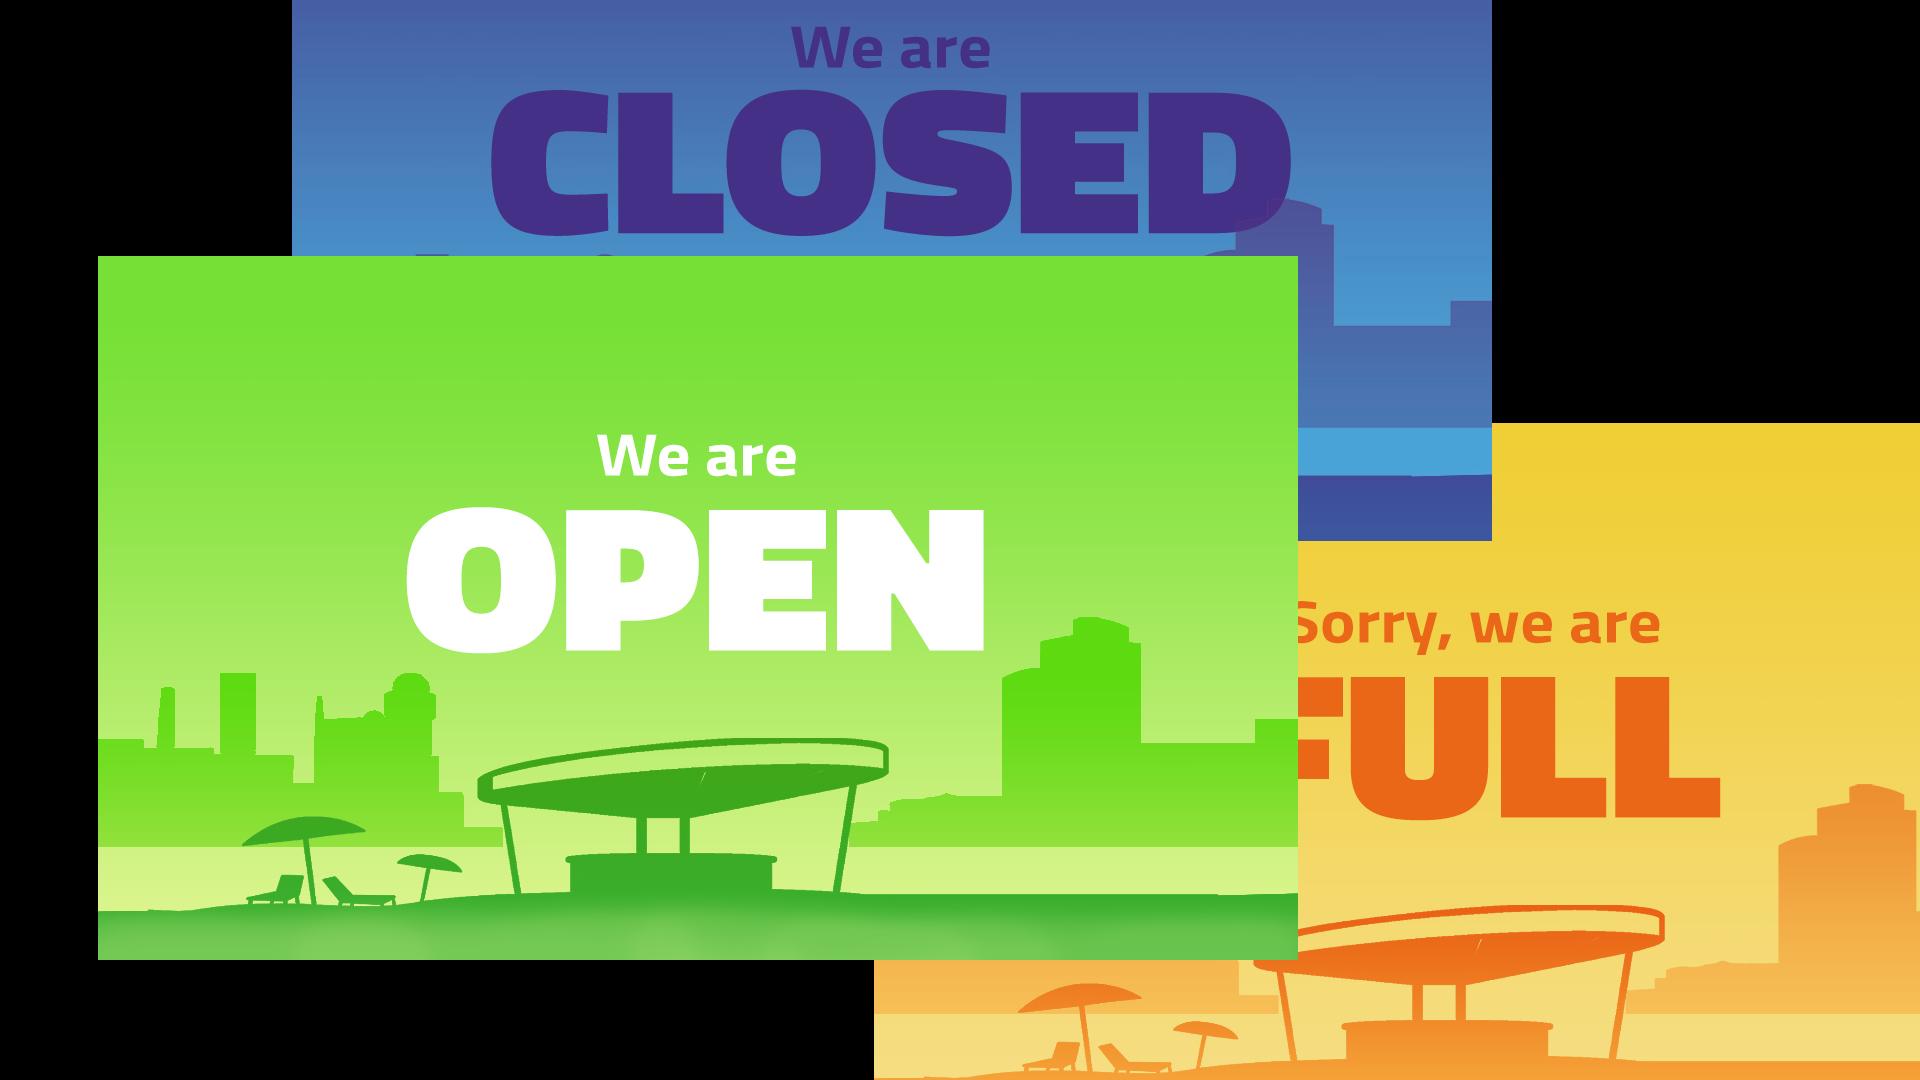 APP Open,Closed,Full